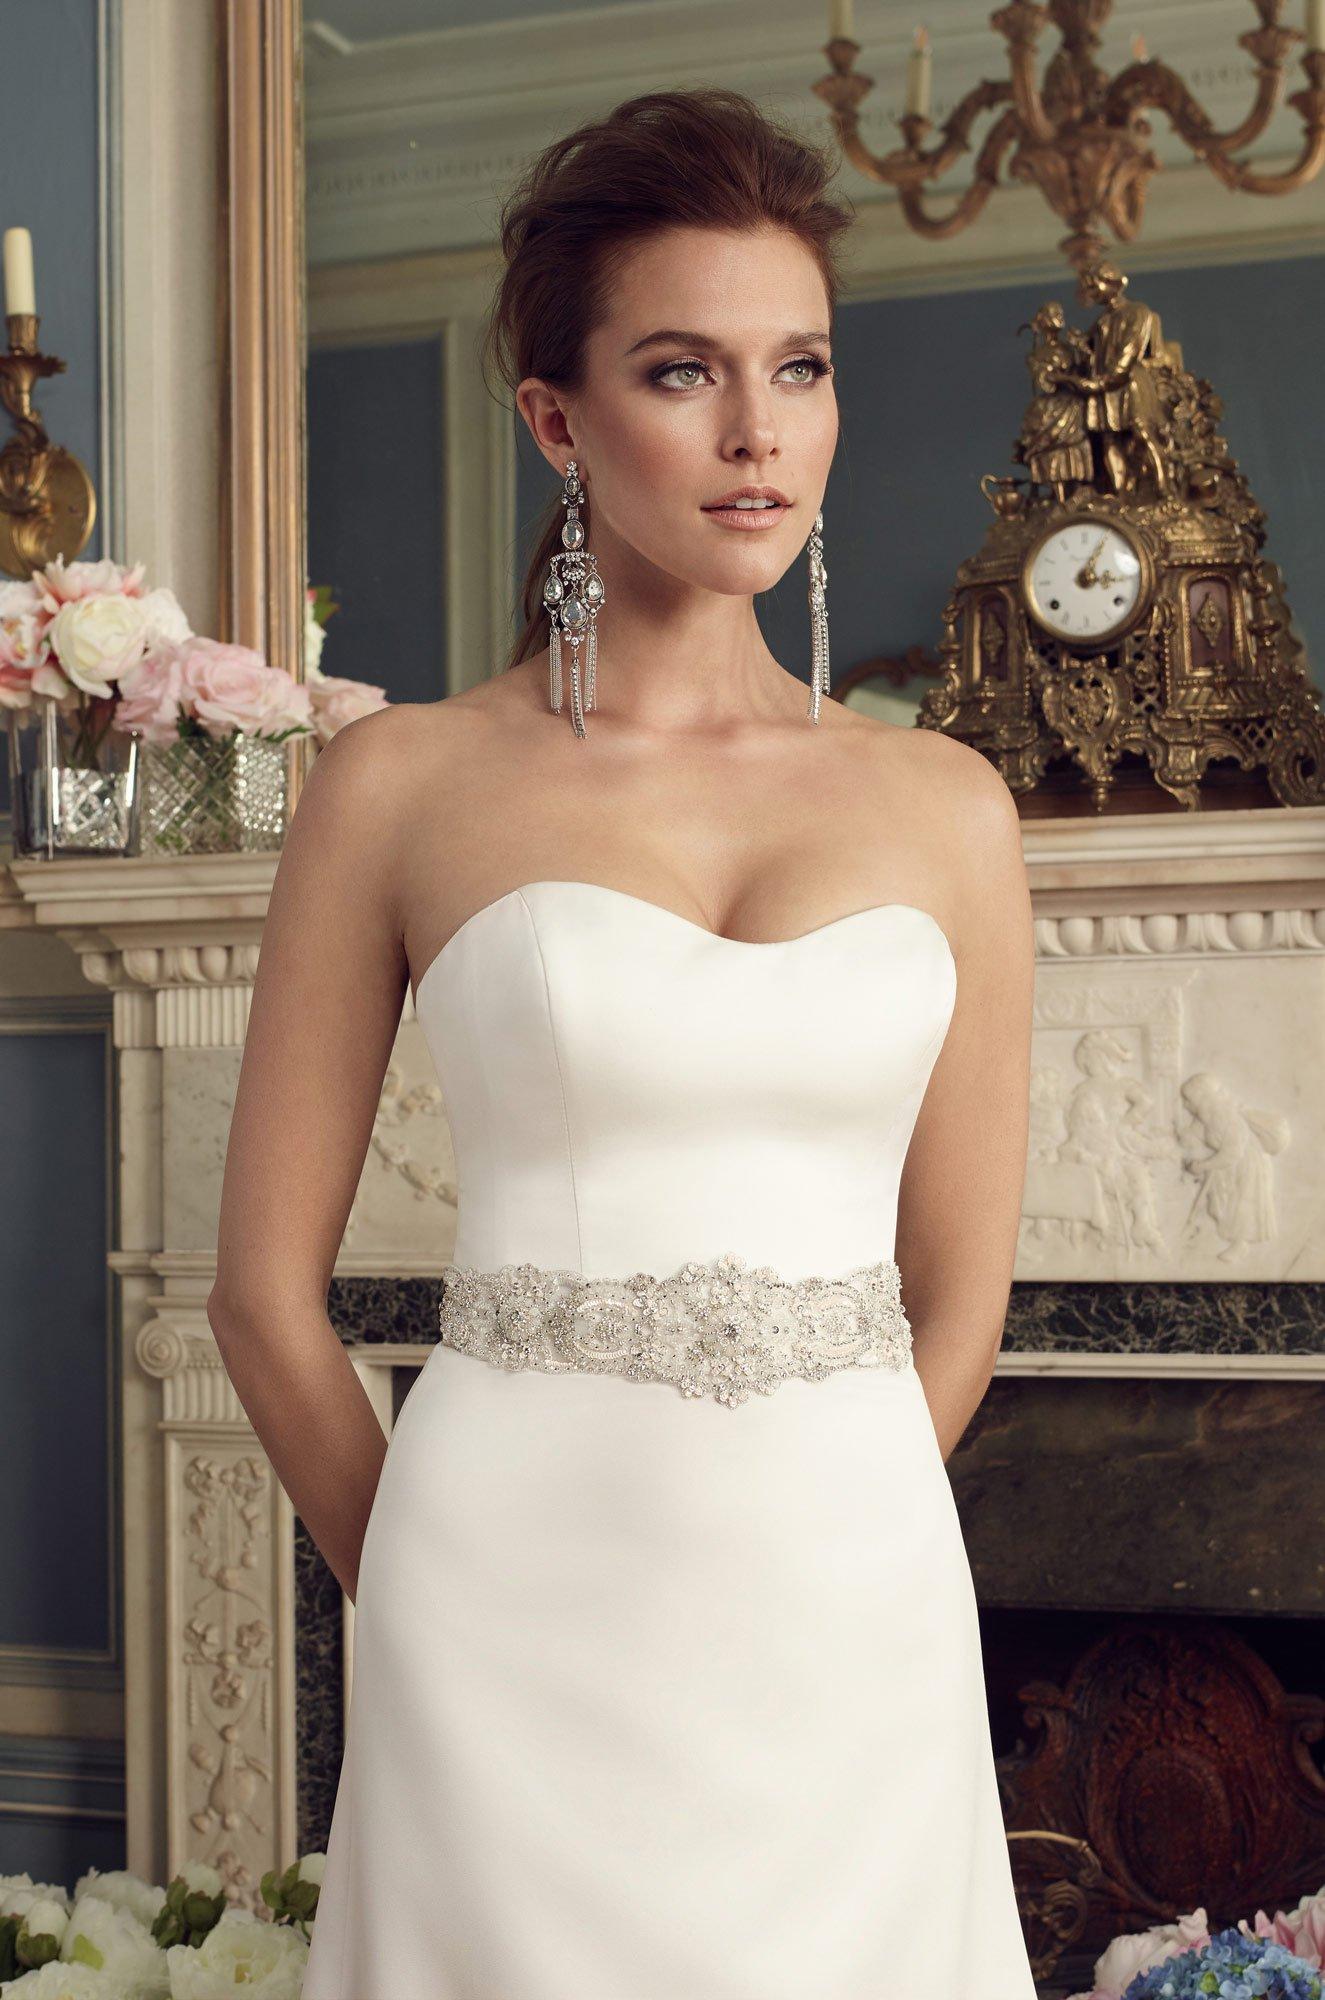 Sweetheart Satin Wedding Dress - Style #2170 | Mikaella Bridal